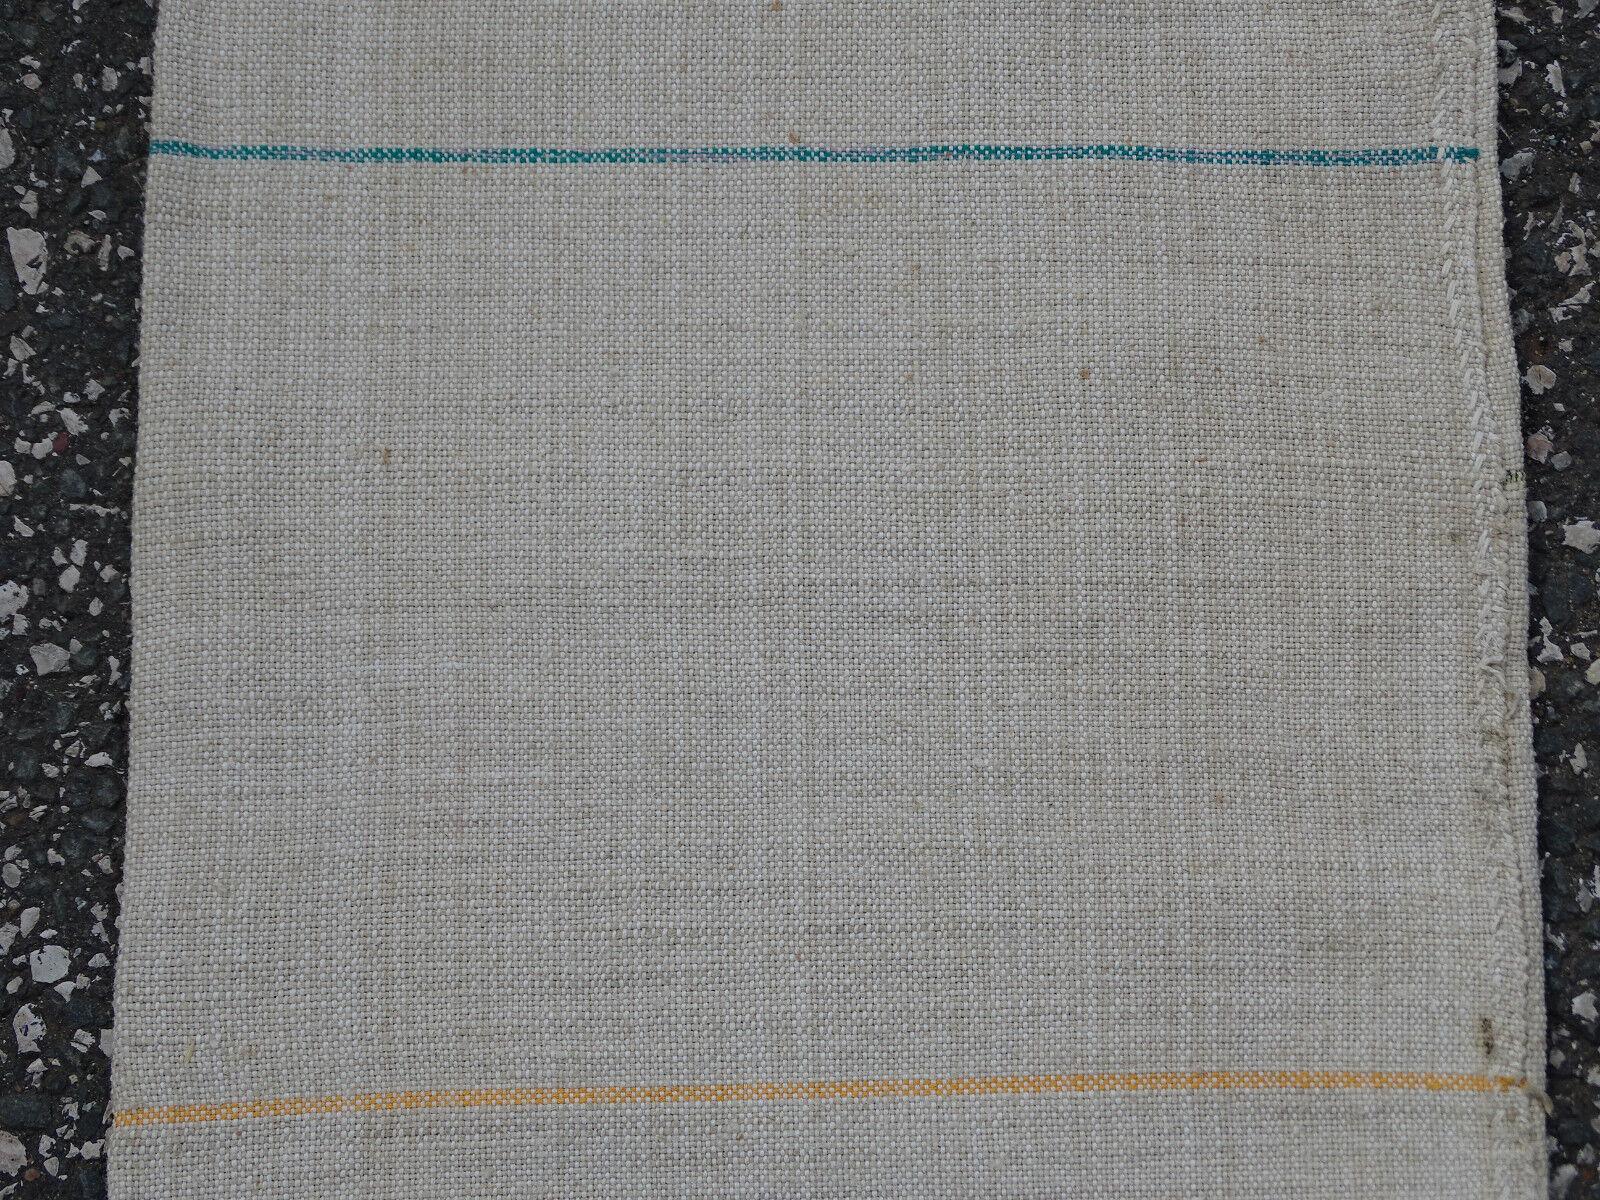 Q3109 Leinensack / Getreidesack um 1940 - old grain bag - SACK LEINEN - TOP